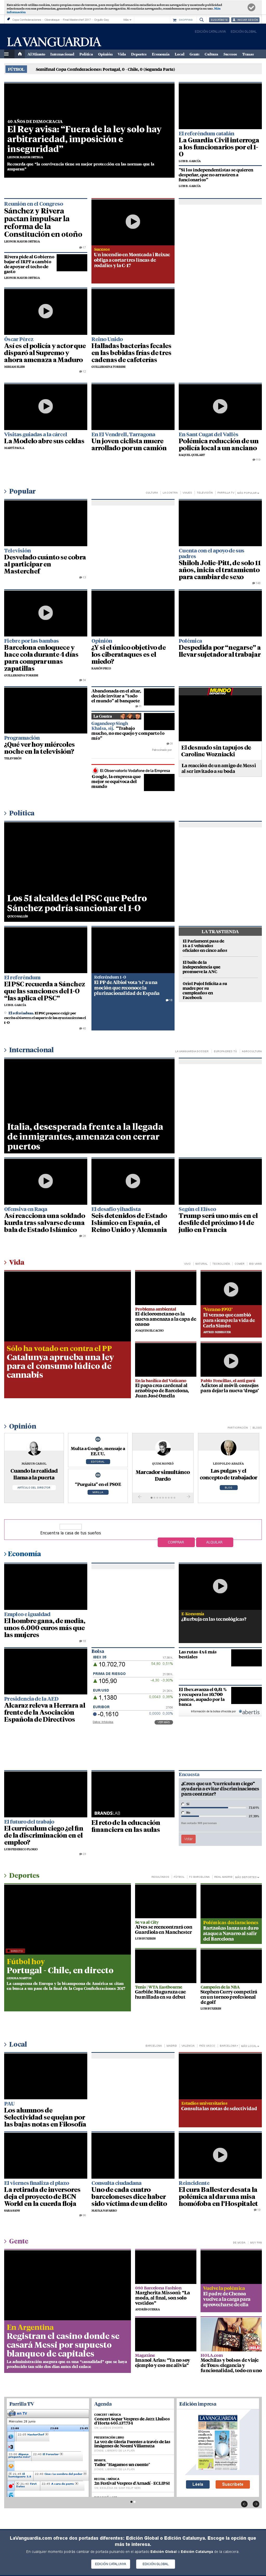 La Vanguardia at Wednesday June 28, 2017, 7:26 p.m. UTC